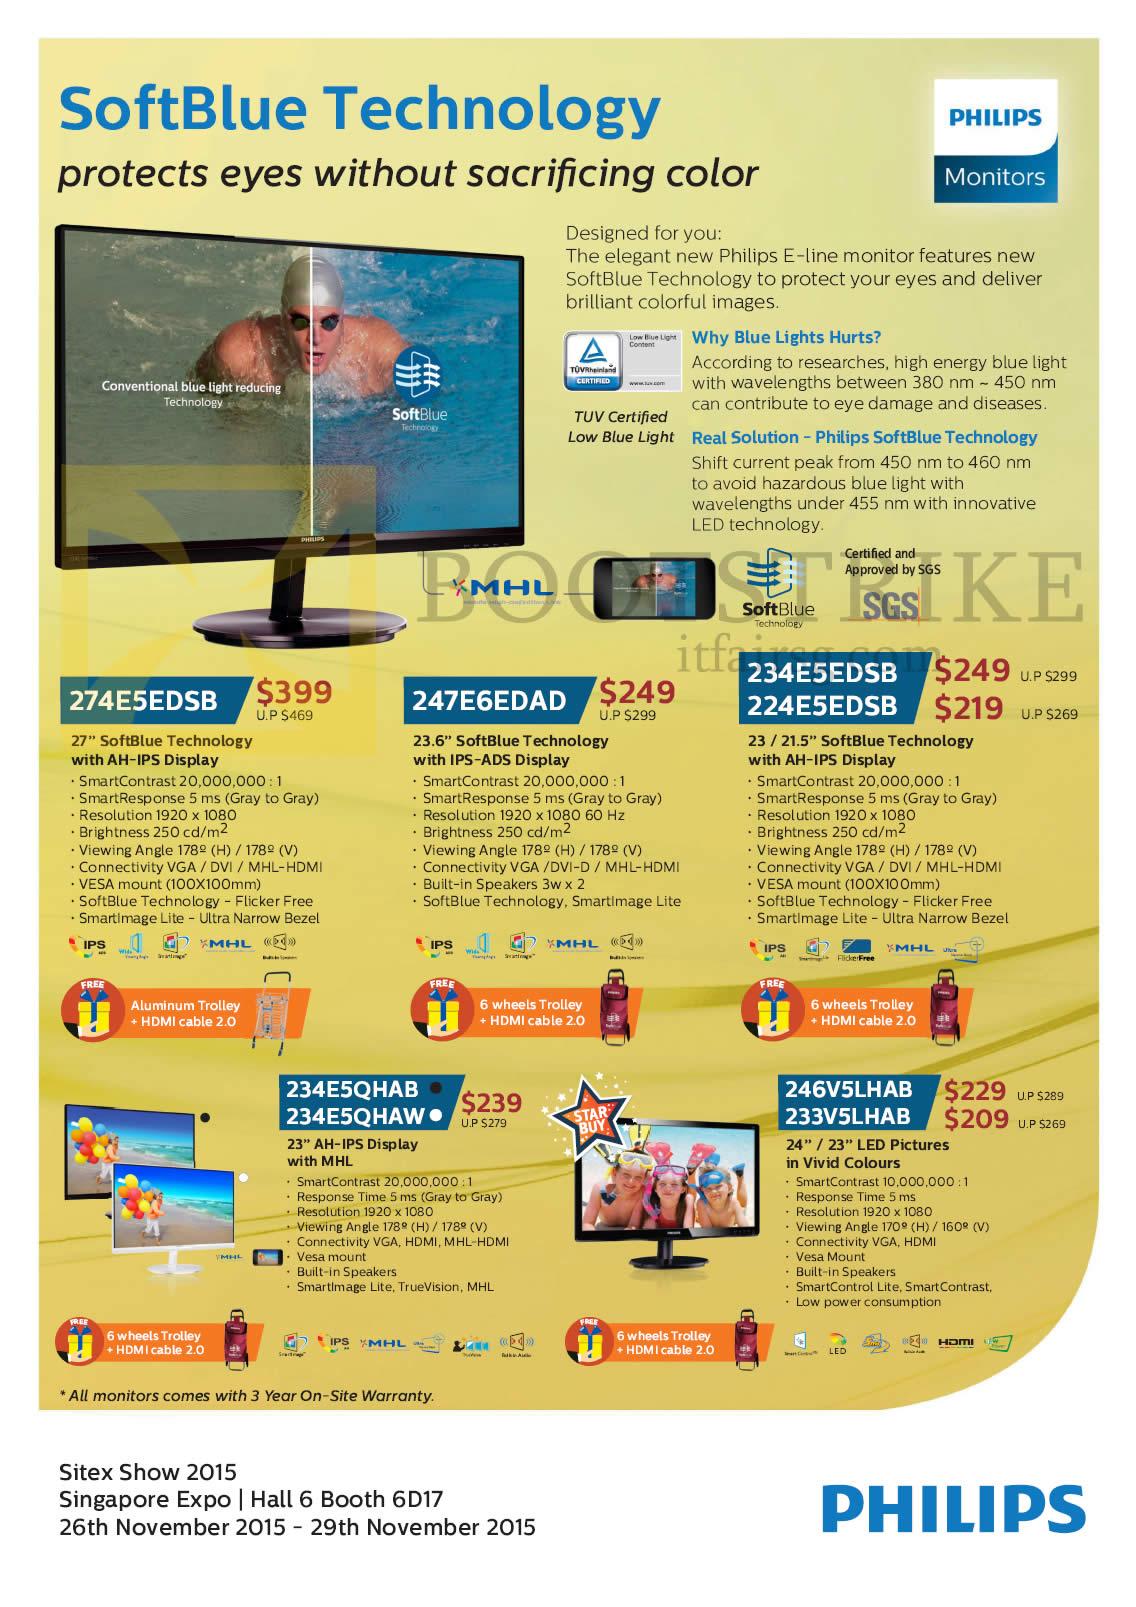 SITEX 2015 price list image brochure of Philips Monitors 274E5EDSB, 247E6EDAD, 234E5EDSB, 24E5EDSB, 234E5QHAB, 234E5QHAW, 246V5LHAB, 233V5LHAB